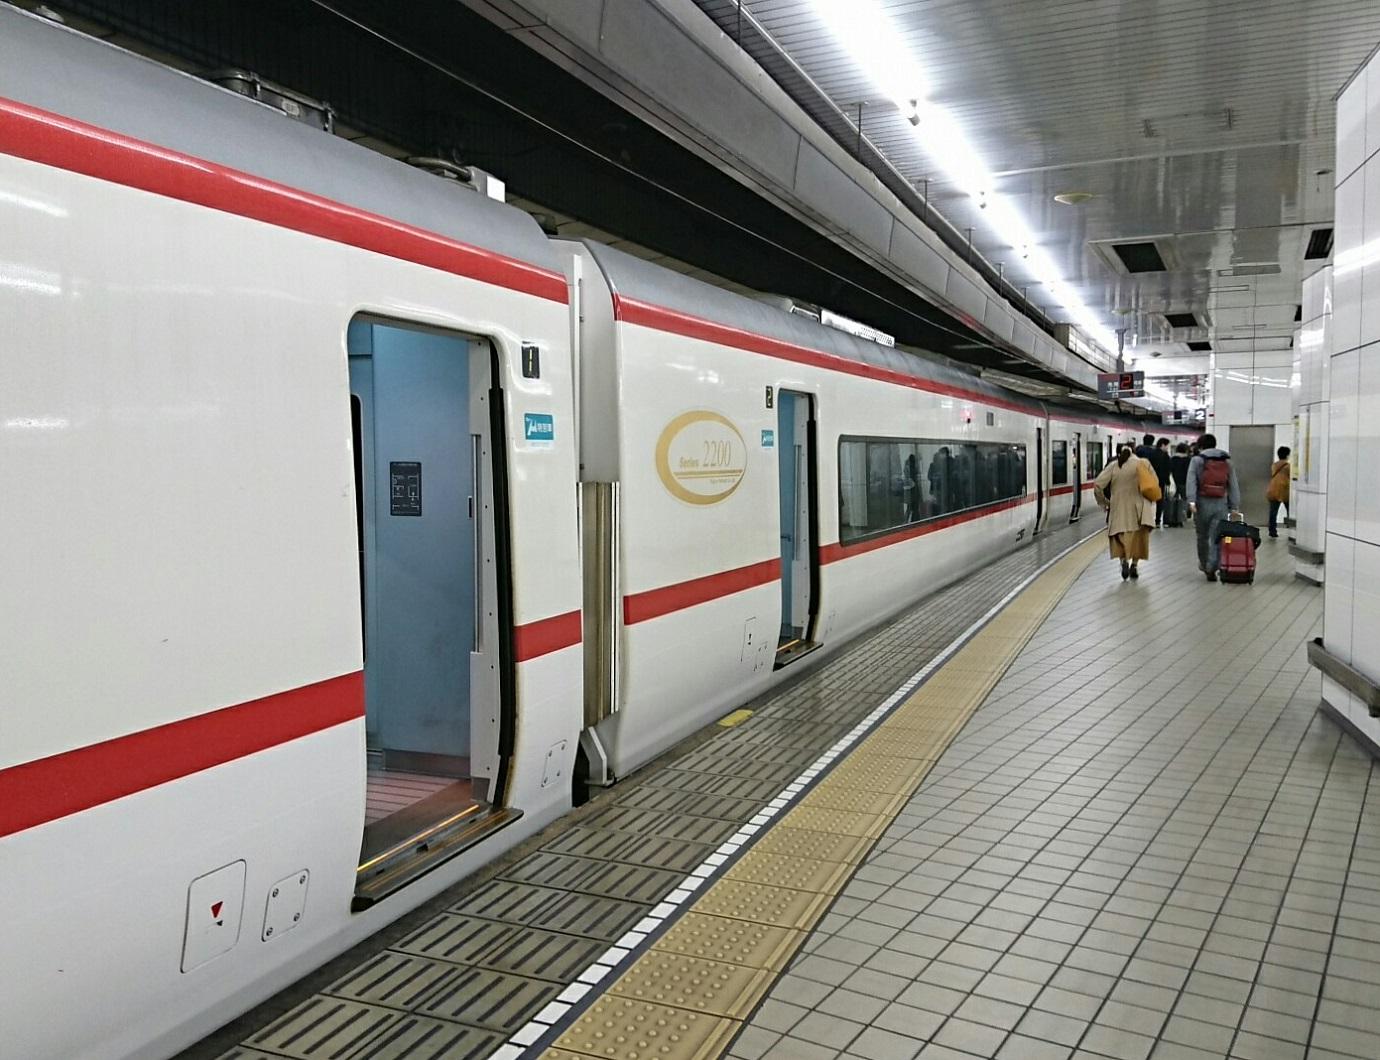 2017.10.28 2017.10.28 守山自衛隊前 (1) 名古屋 - 岐阜いき特急 1380-1060